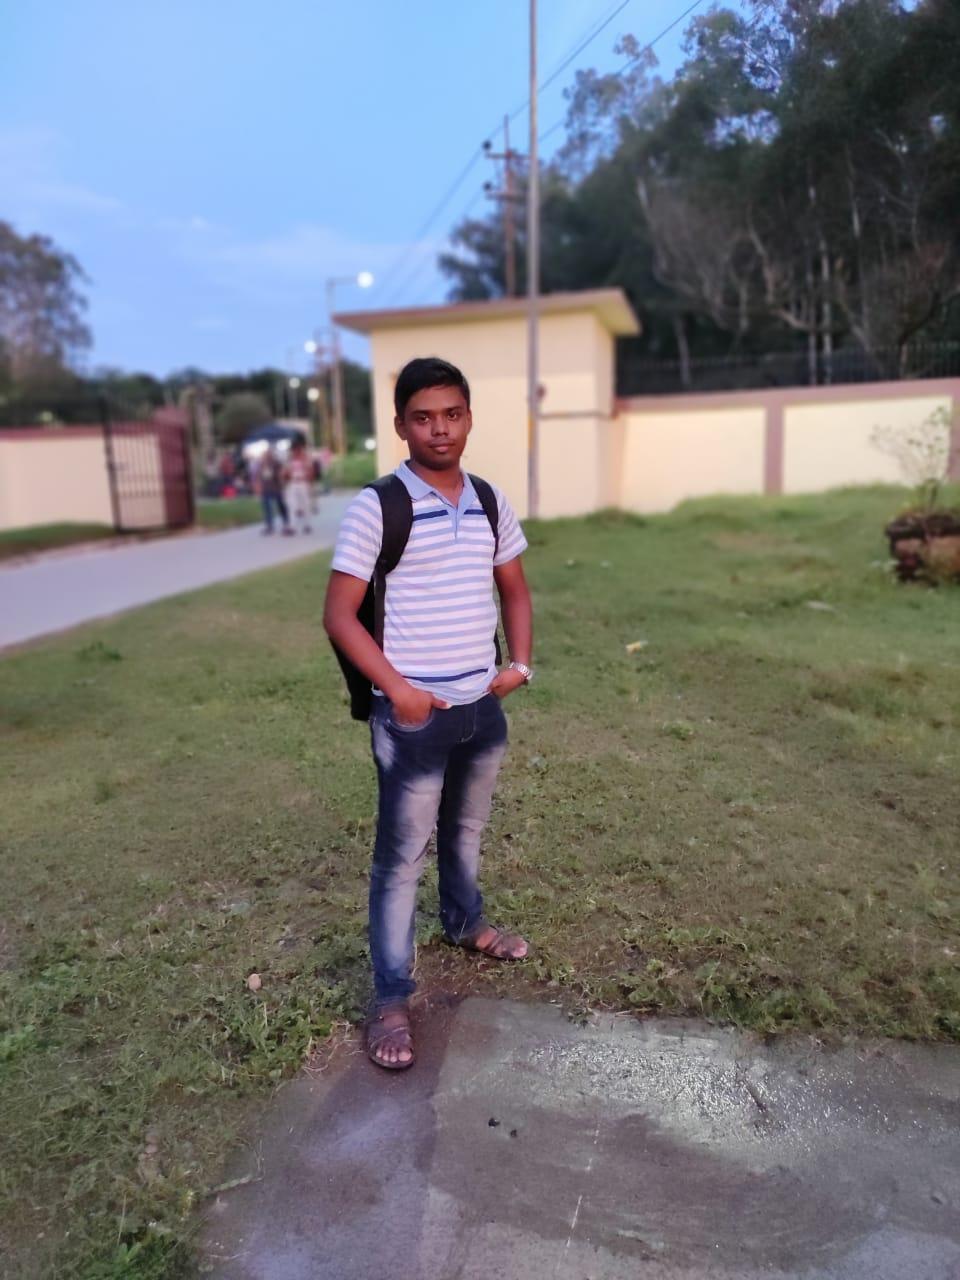 Soumyadeep Ghosh